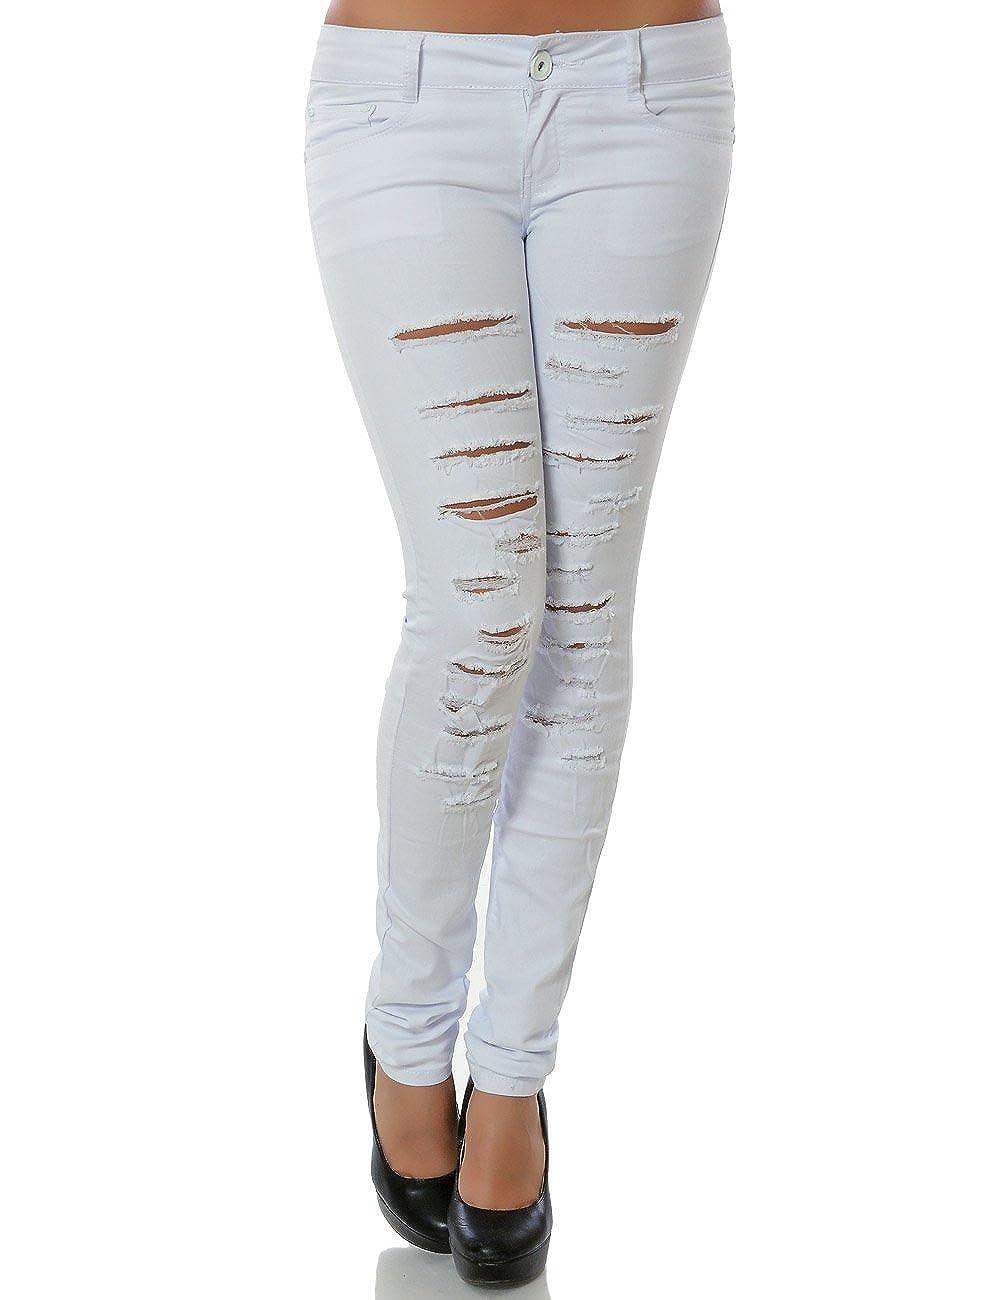 Damen Jeans Hose Hüftjeans Hüfthose Röhre Skinny Slim Fit Stretch Low No 15543